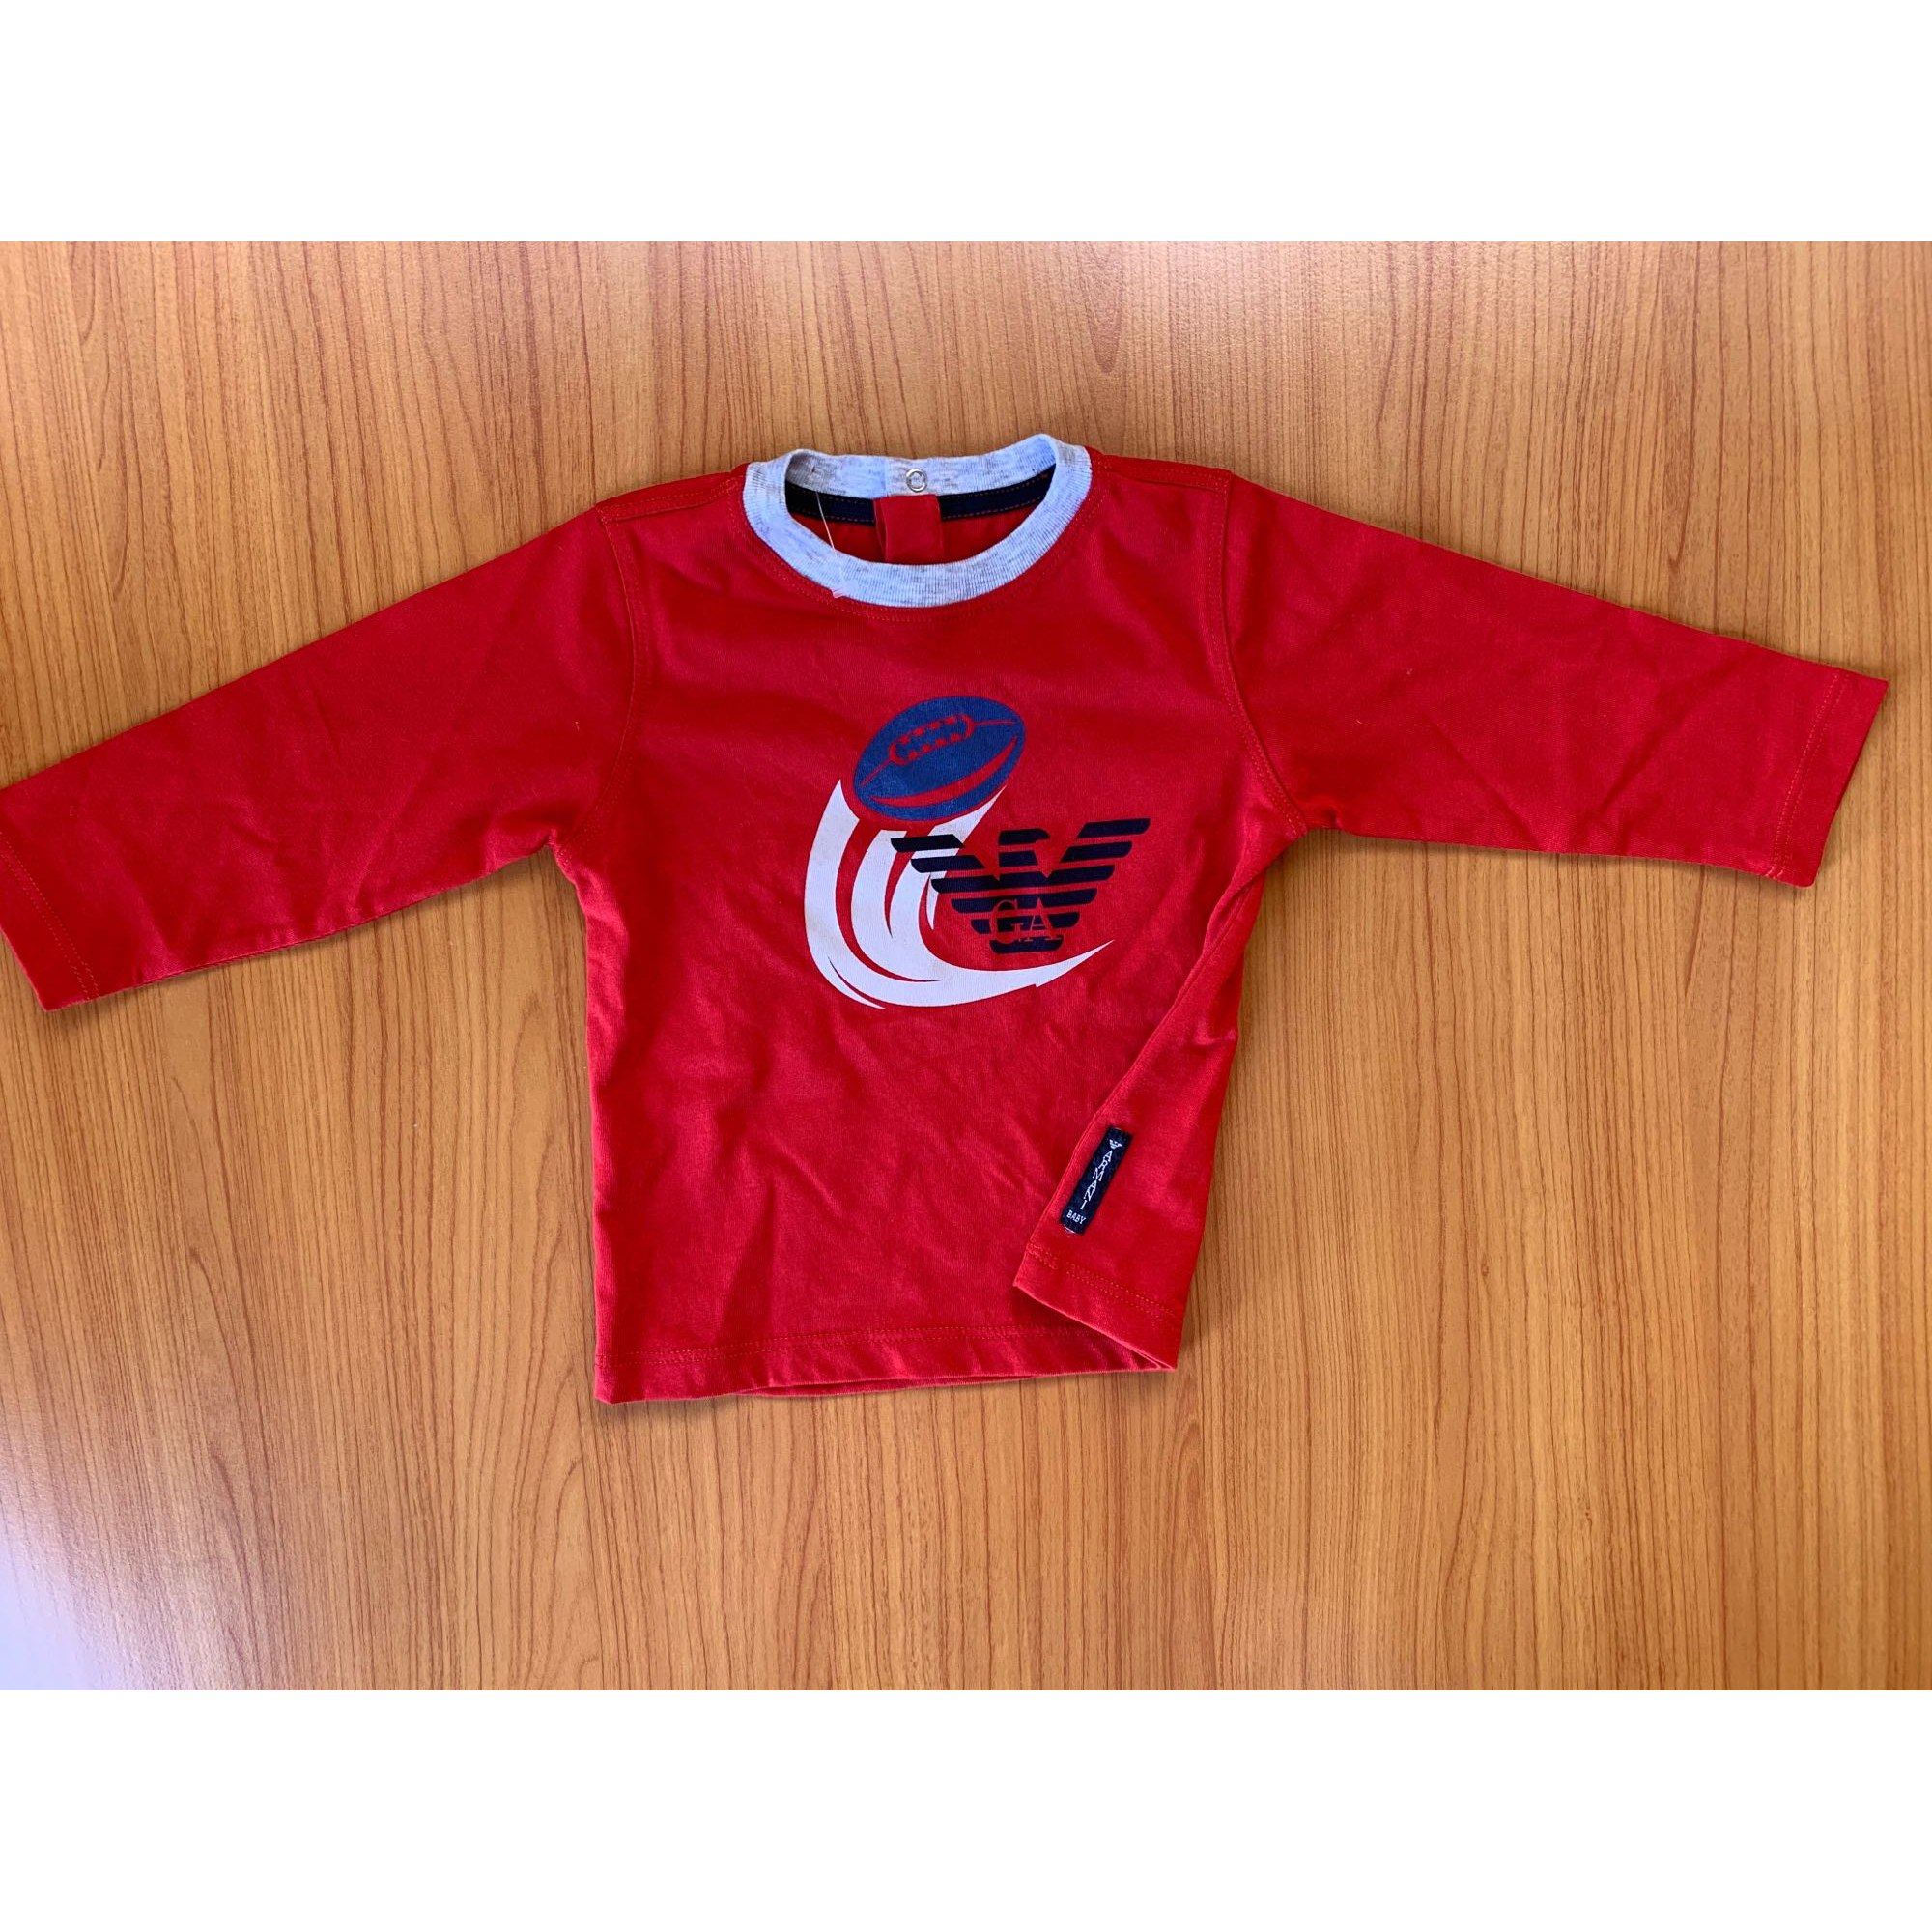 Top, tee shirt ARMANI Rouge, bordeaux